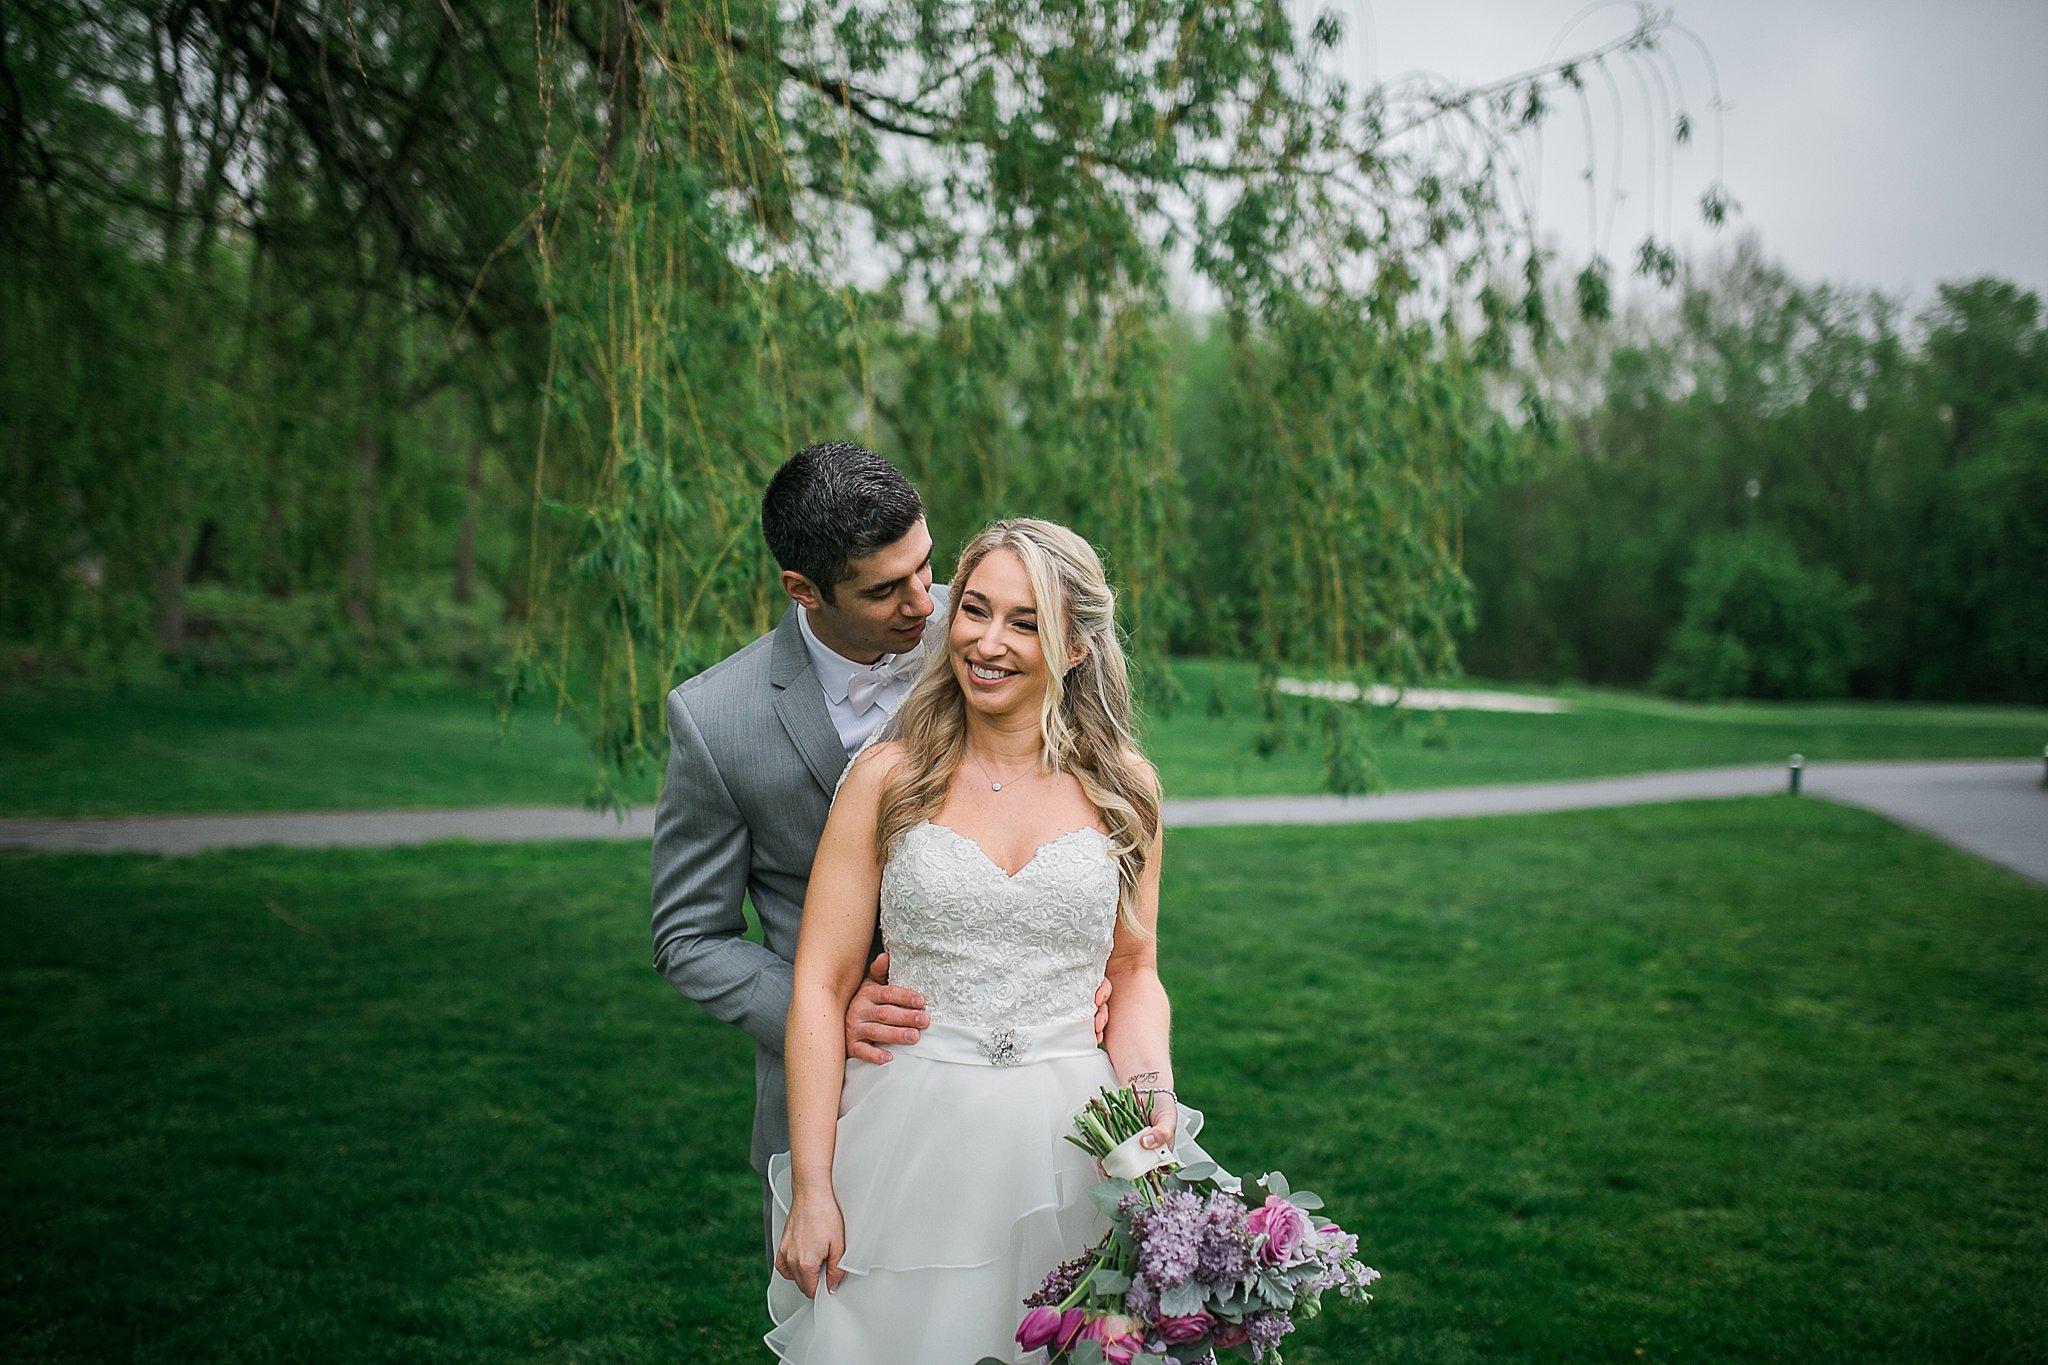 West Hills Country Club Wedding Hudson Valley Wedding Photographer Sweet Alice Photography 72.jpg